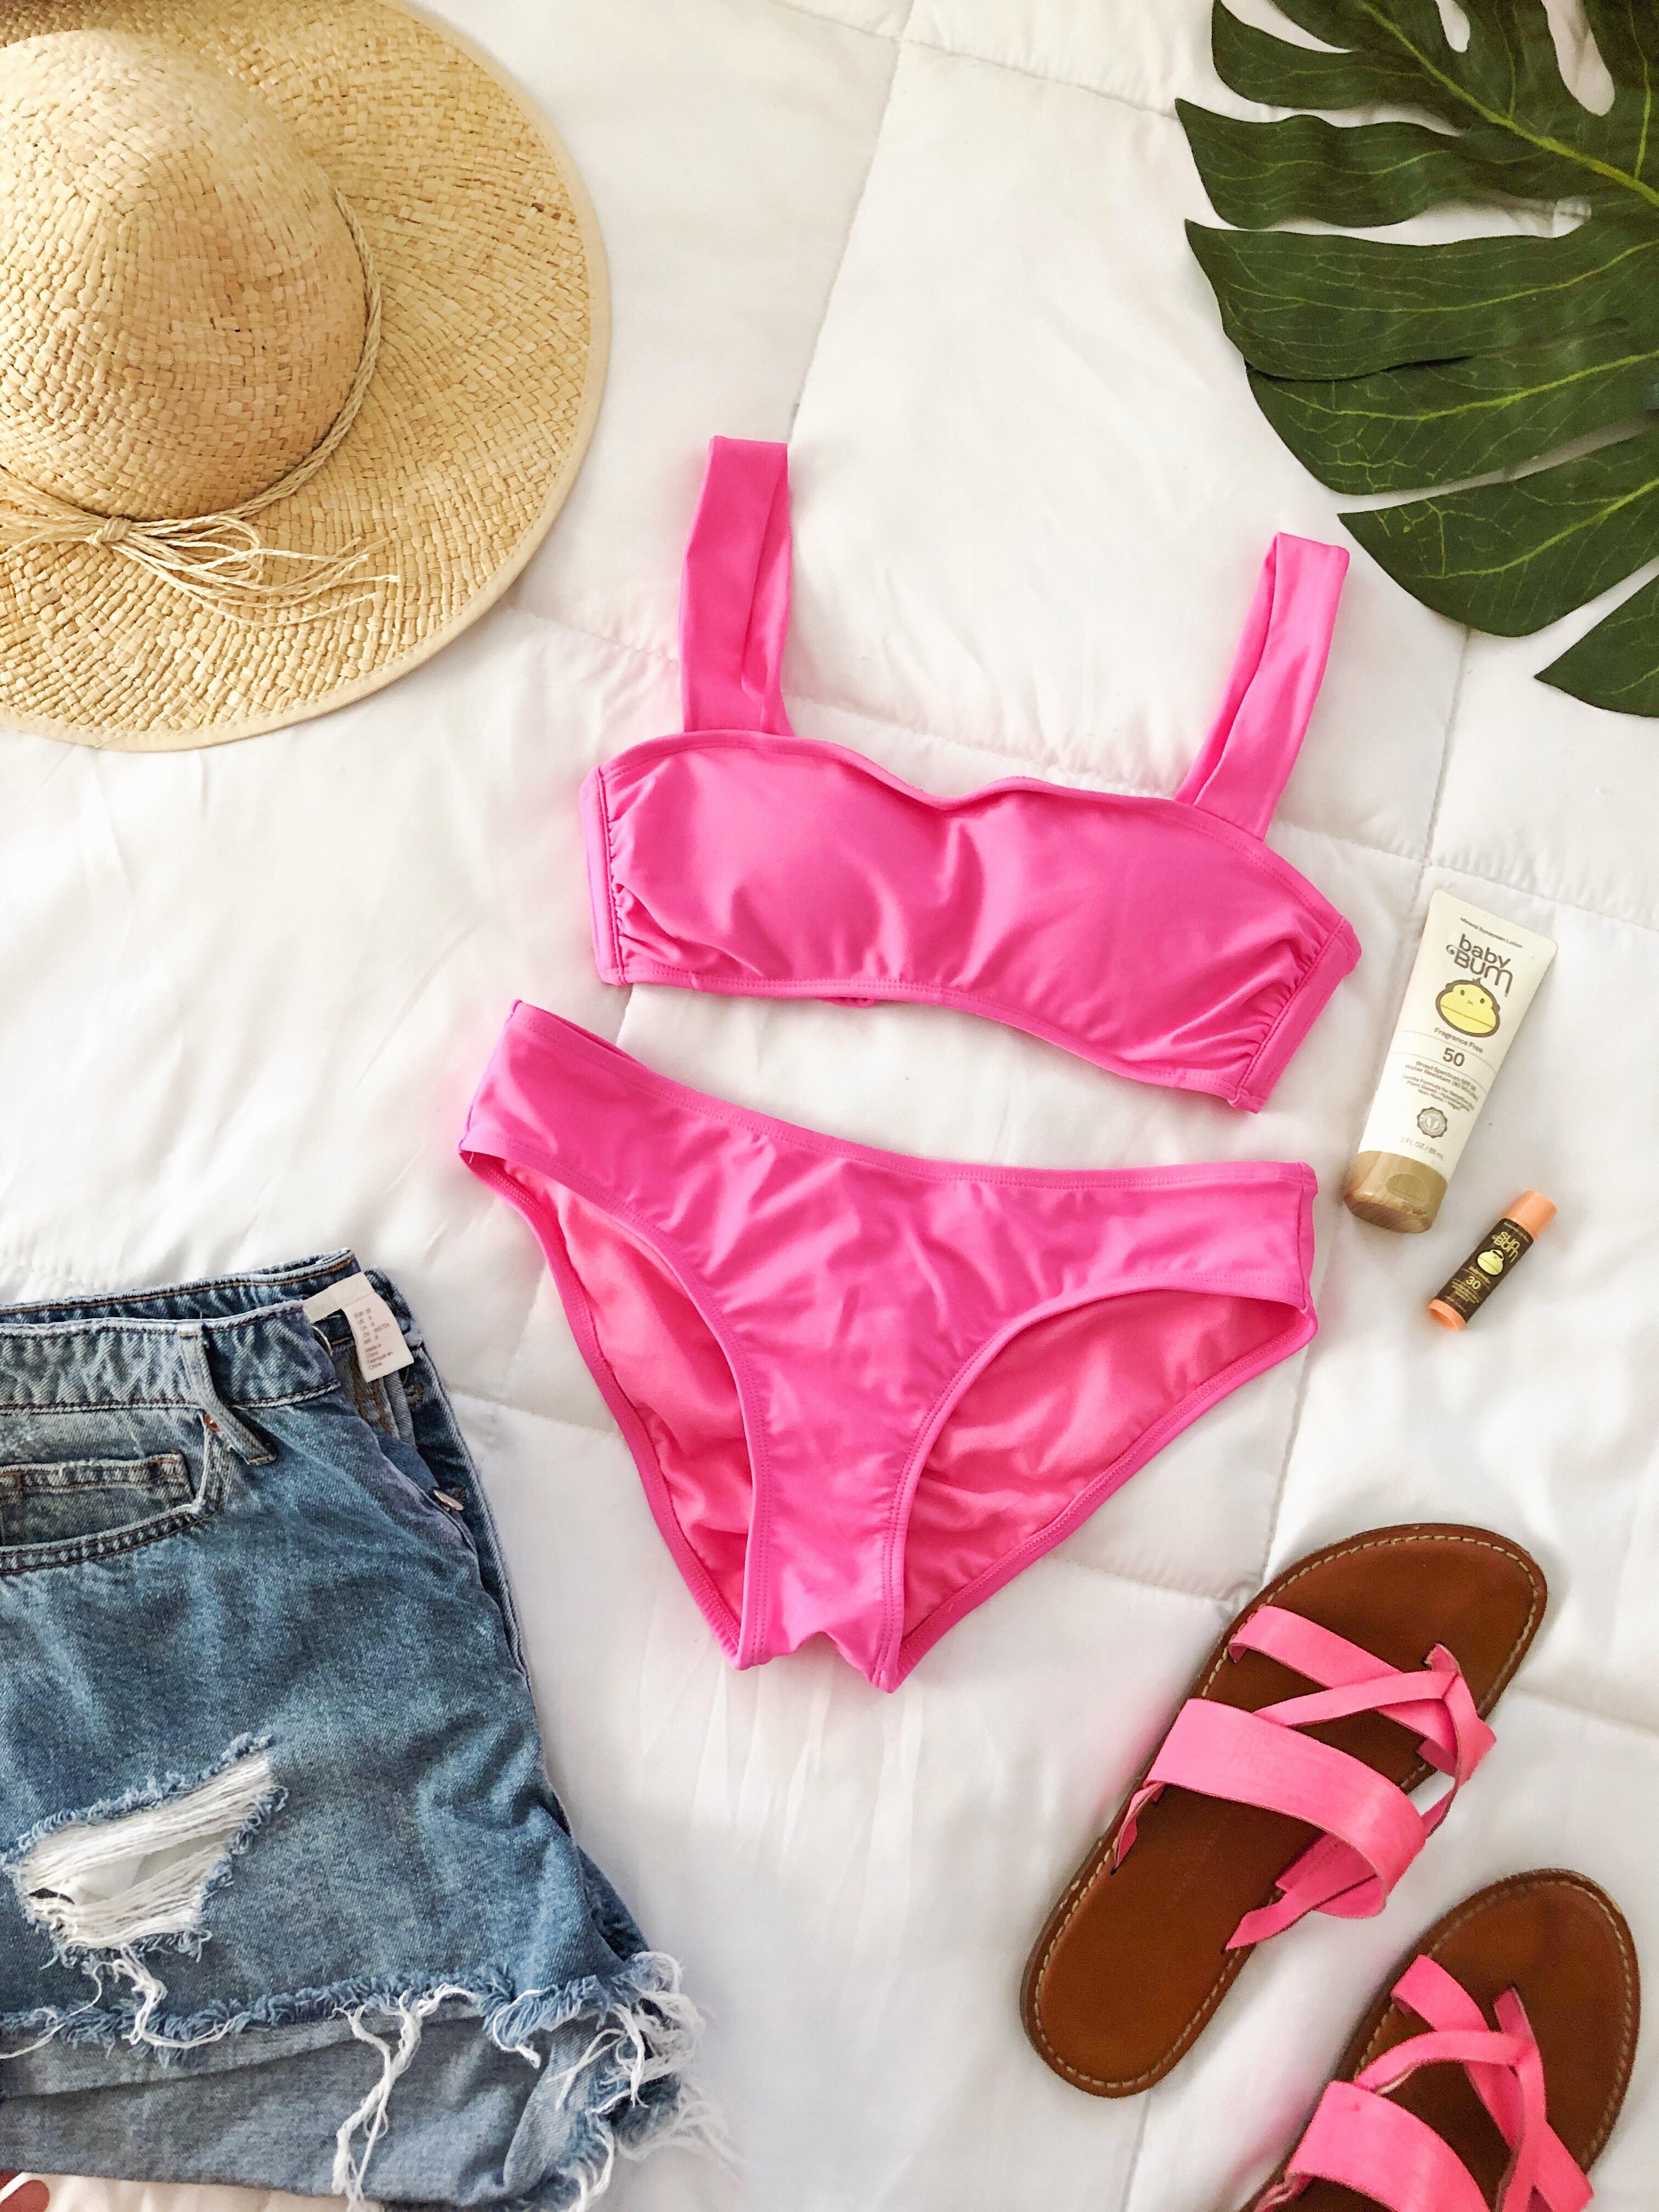 Pink Swimsuits for Summer | Summer Swimsuits 2019 | Summer Swimwear #beach #bikini #swimsuit #summer